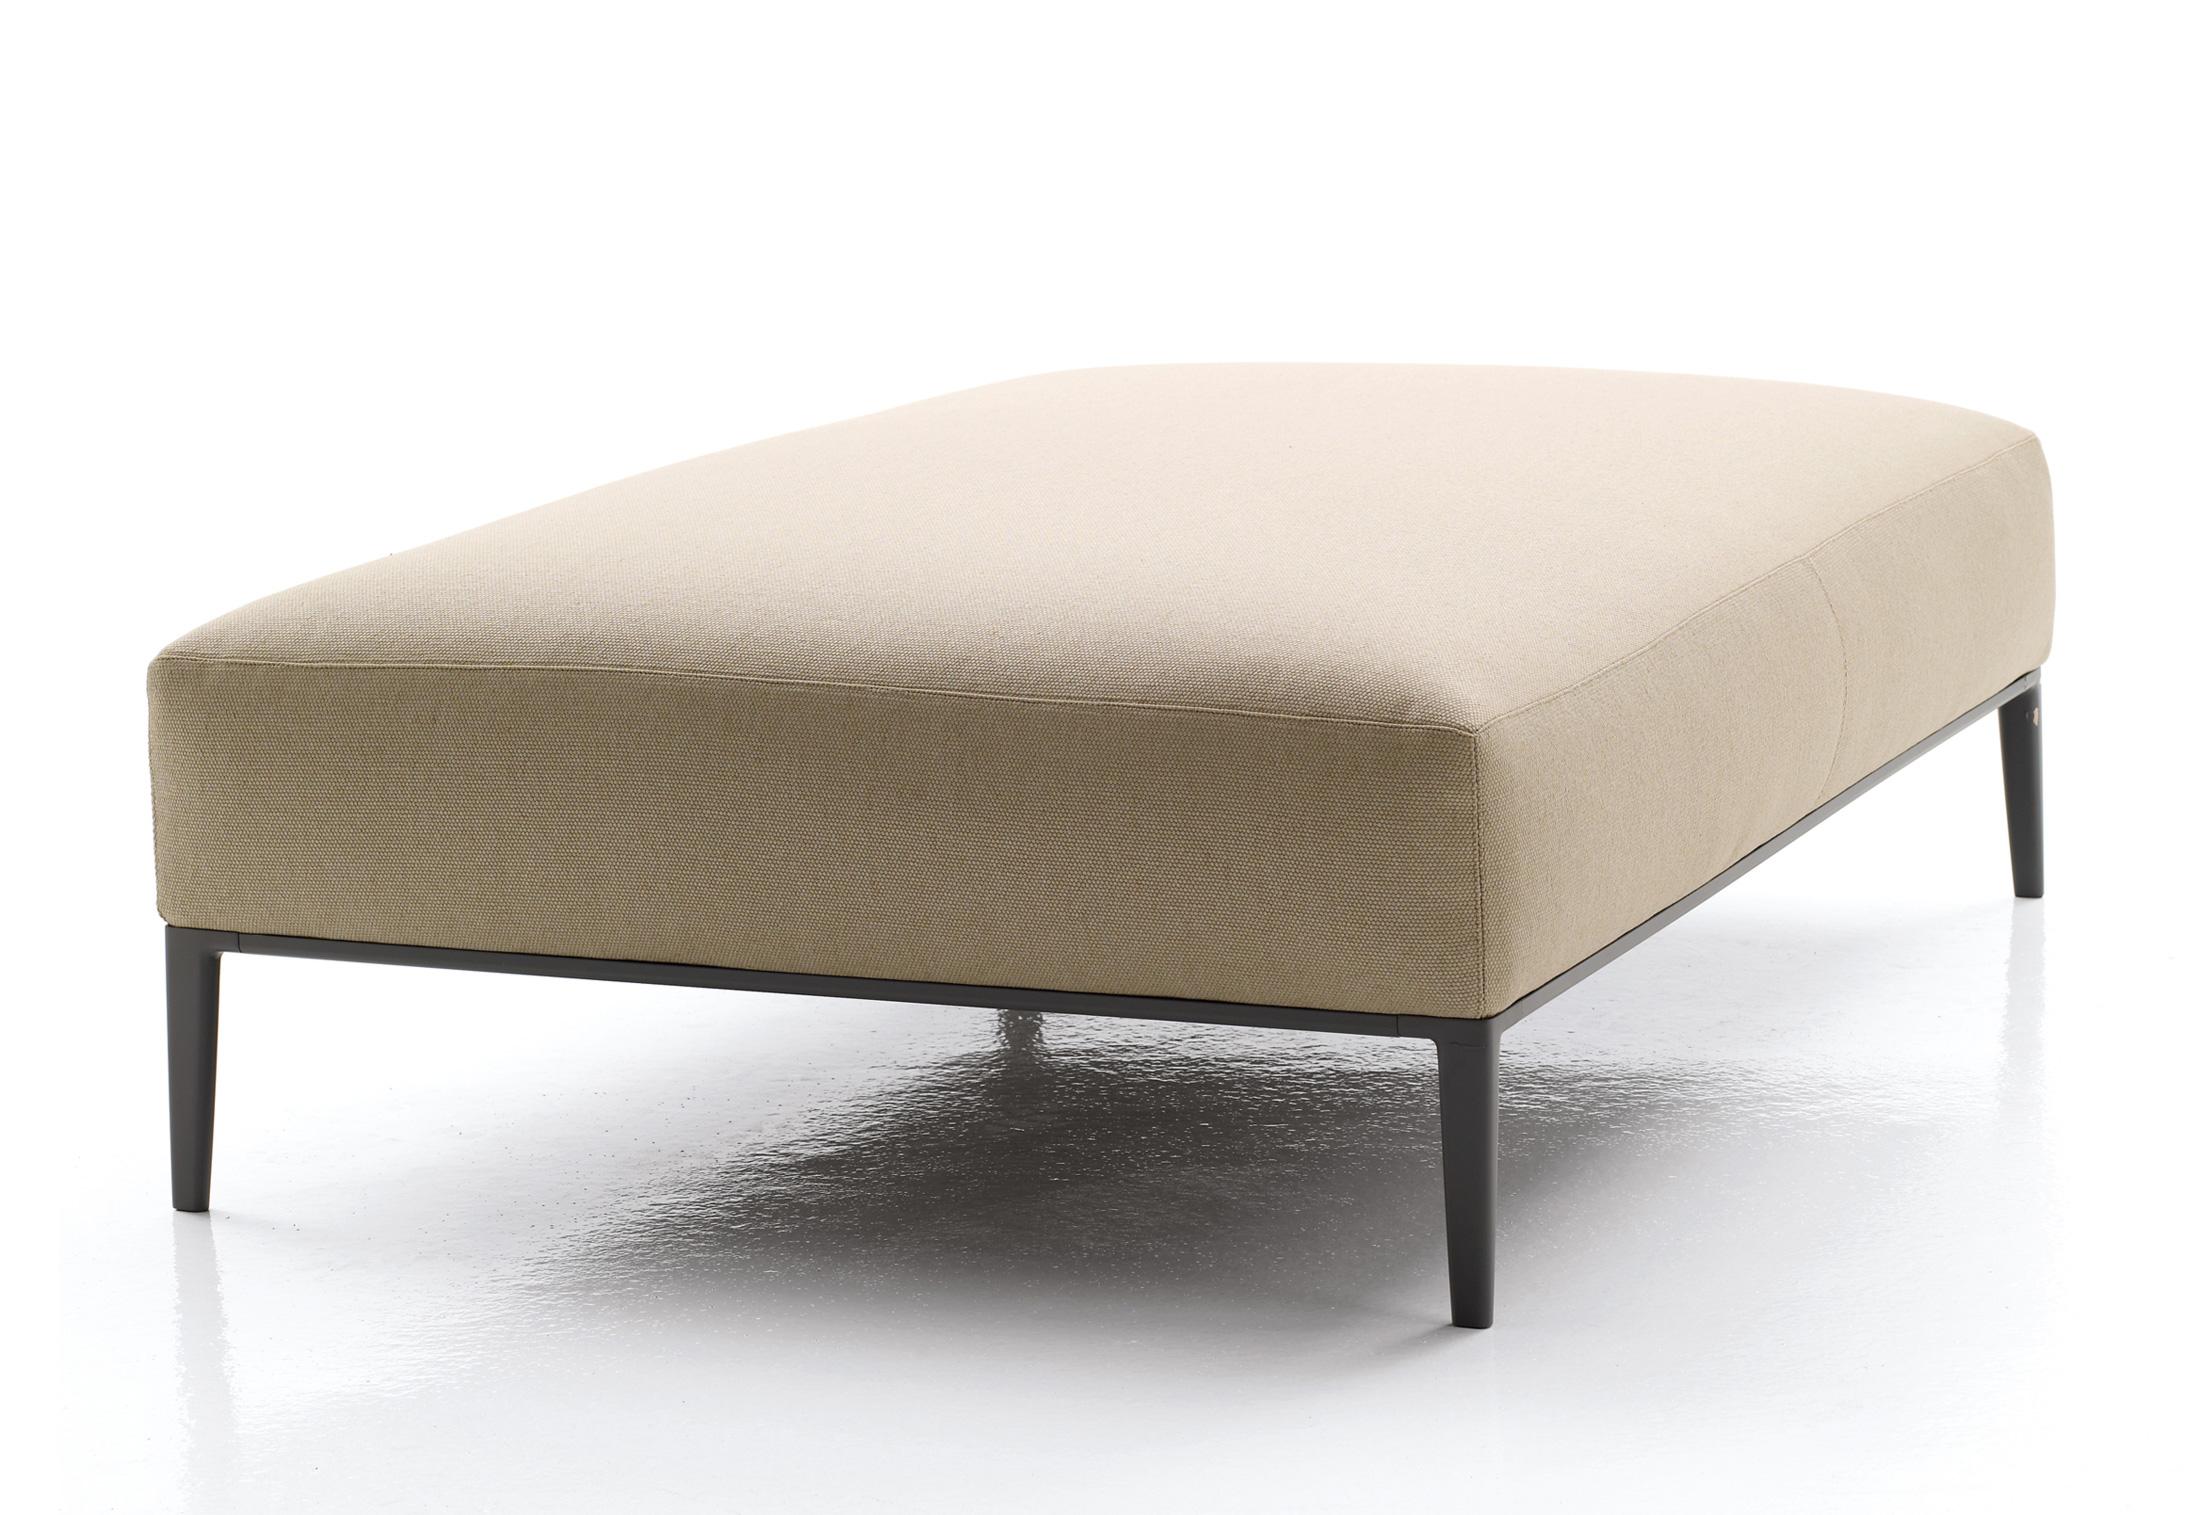 Excellent Jean Ottoman By Bb Italia Stylepark Creativecarmelina Interior Chair Design Creativecarmelinacom